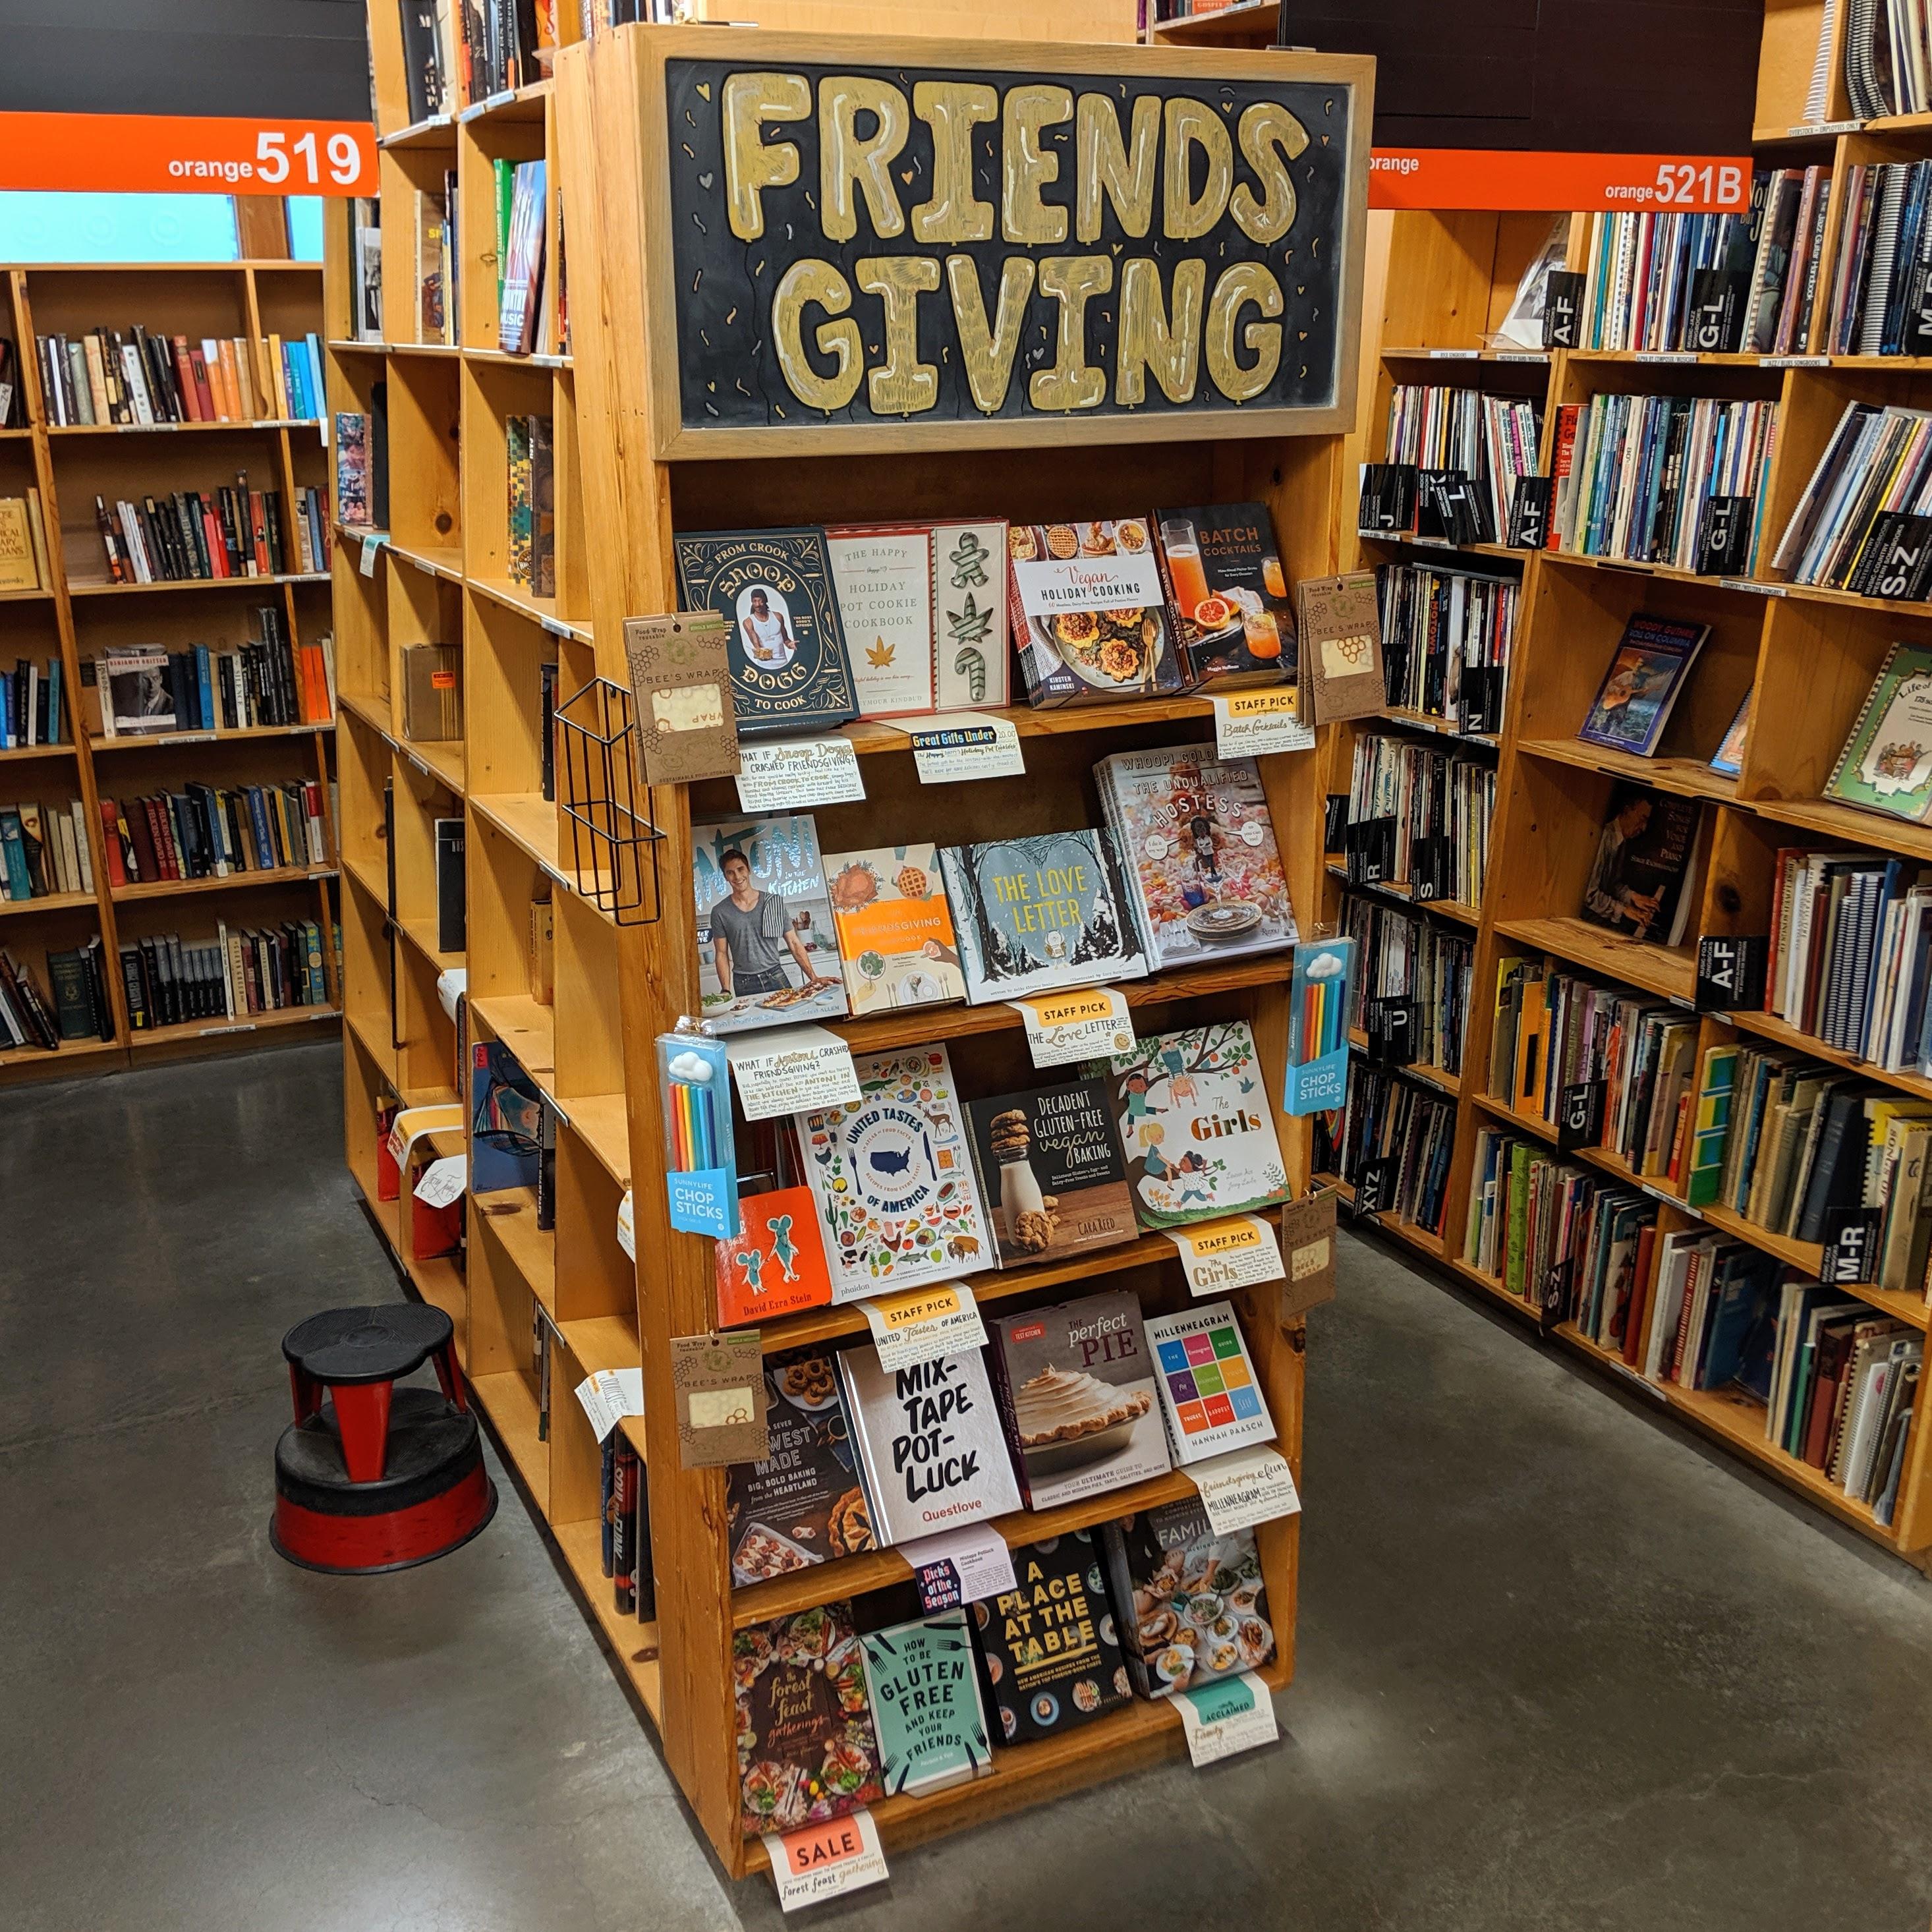 Friendsgiving